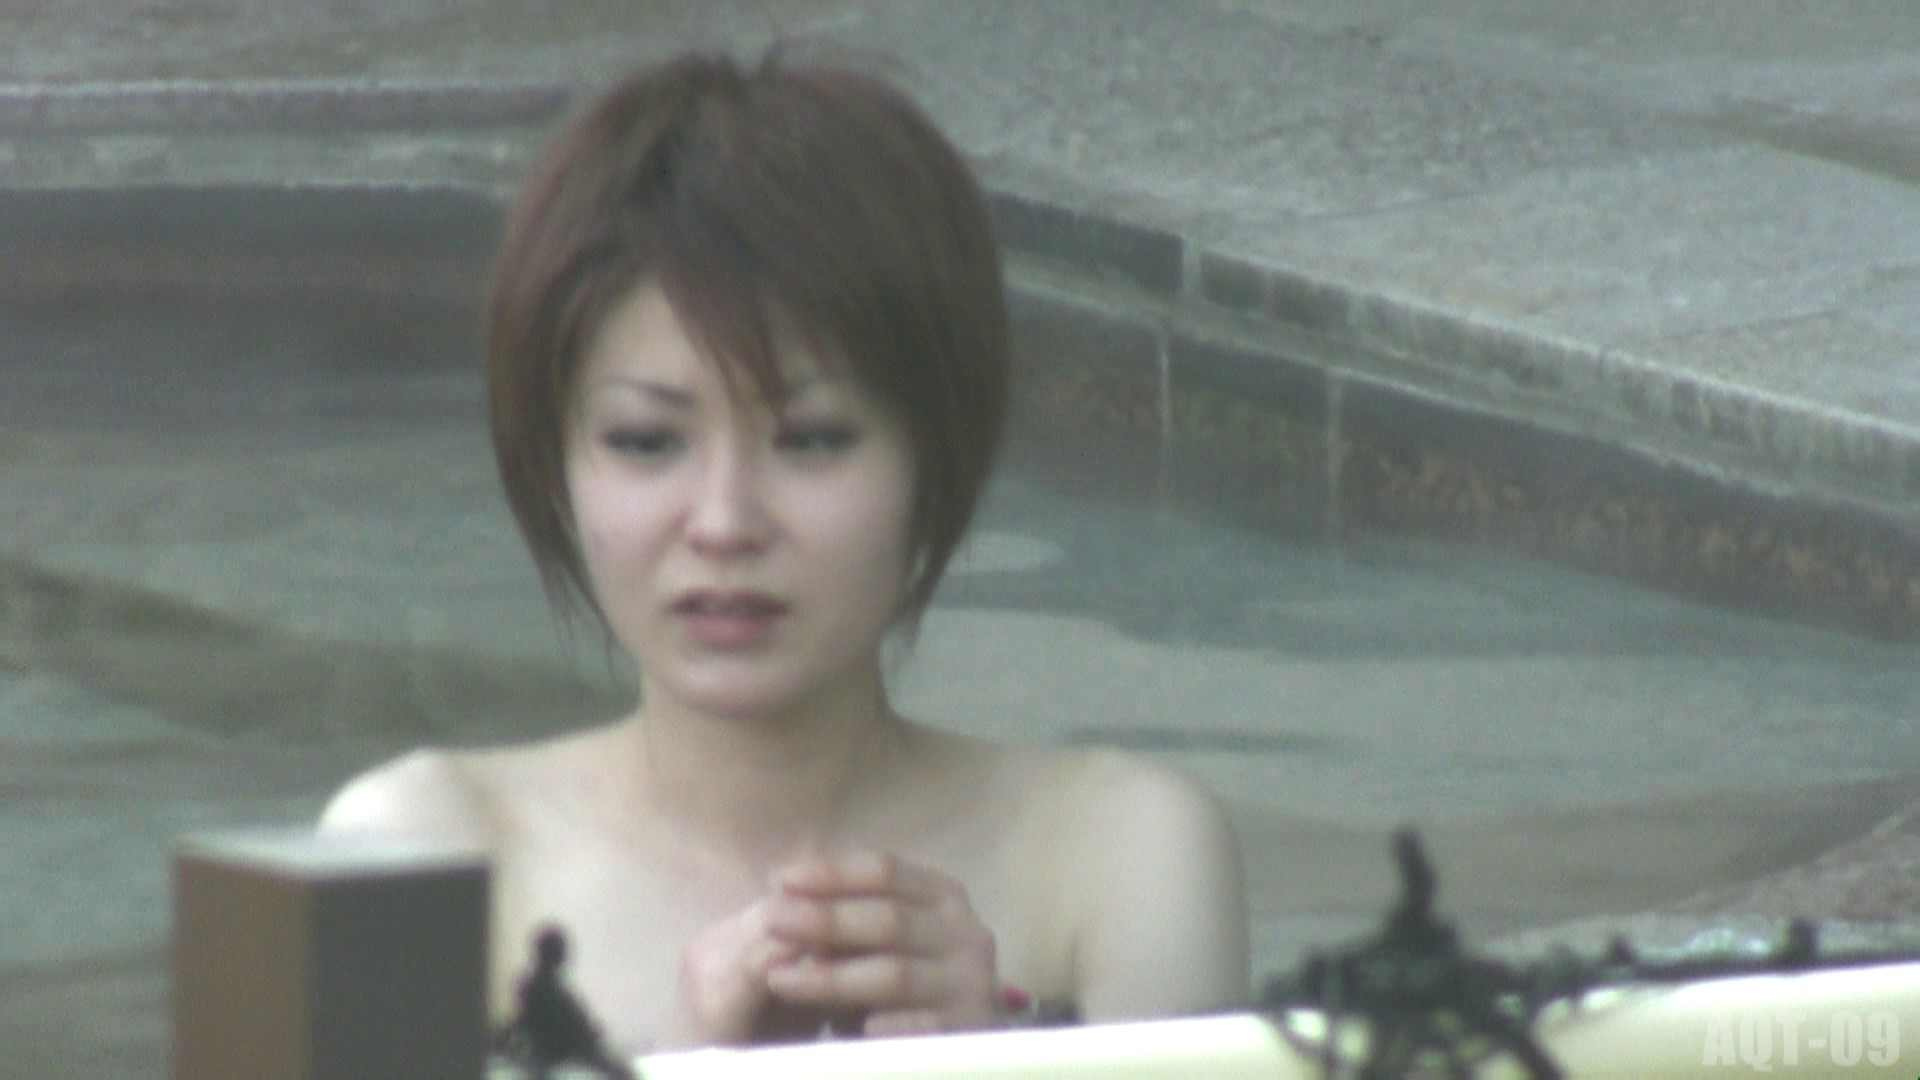 Aquaな露天風呂Vol.779 露天風呂 | OLのエロ生活  81連発 64